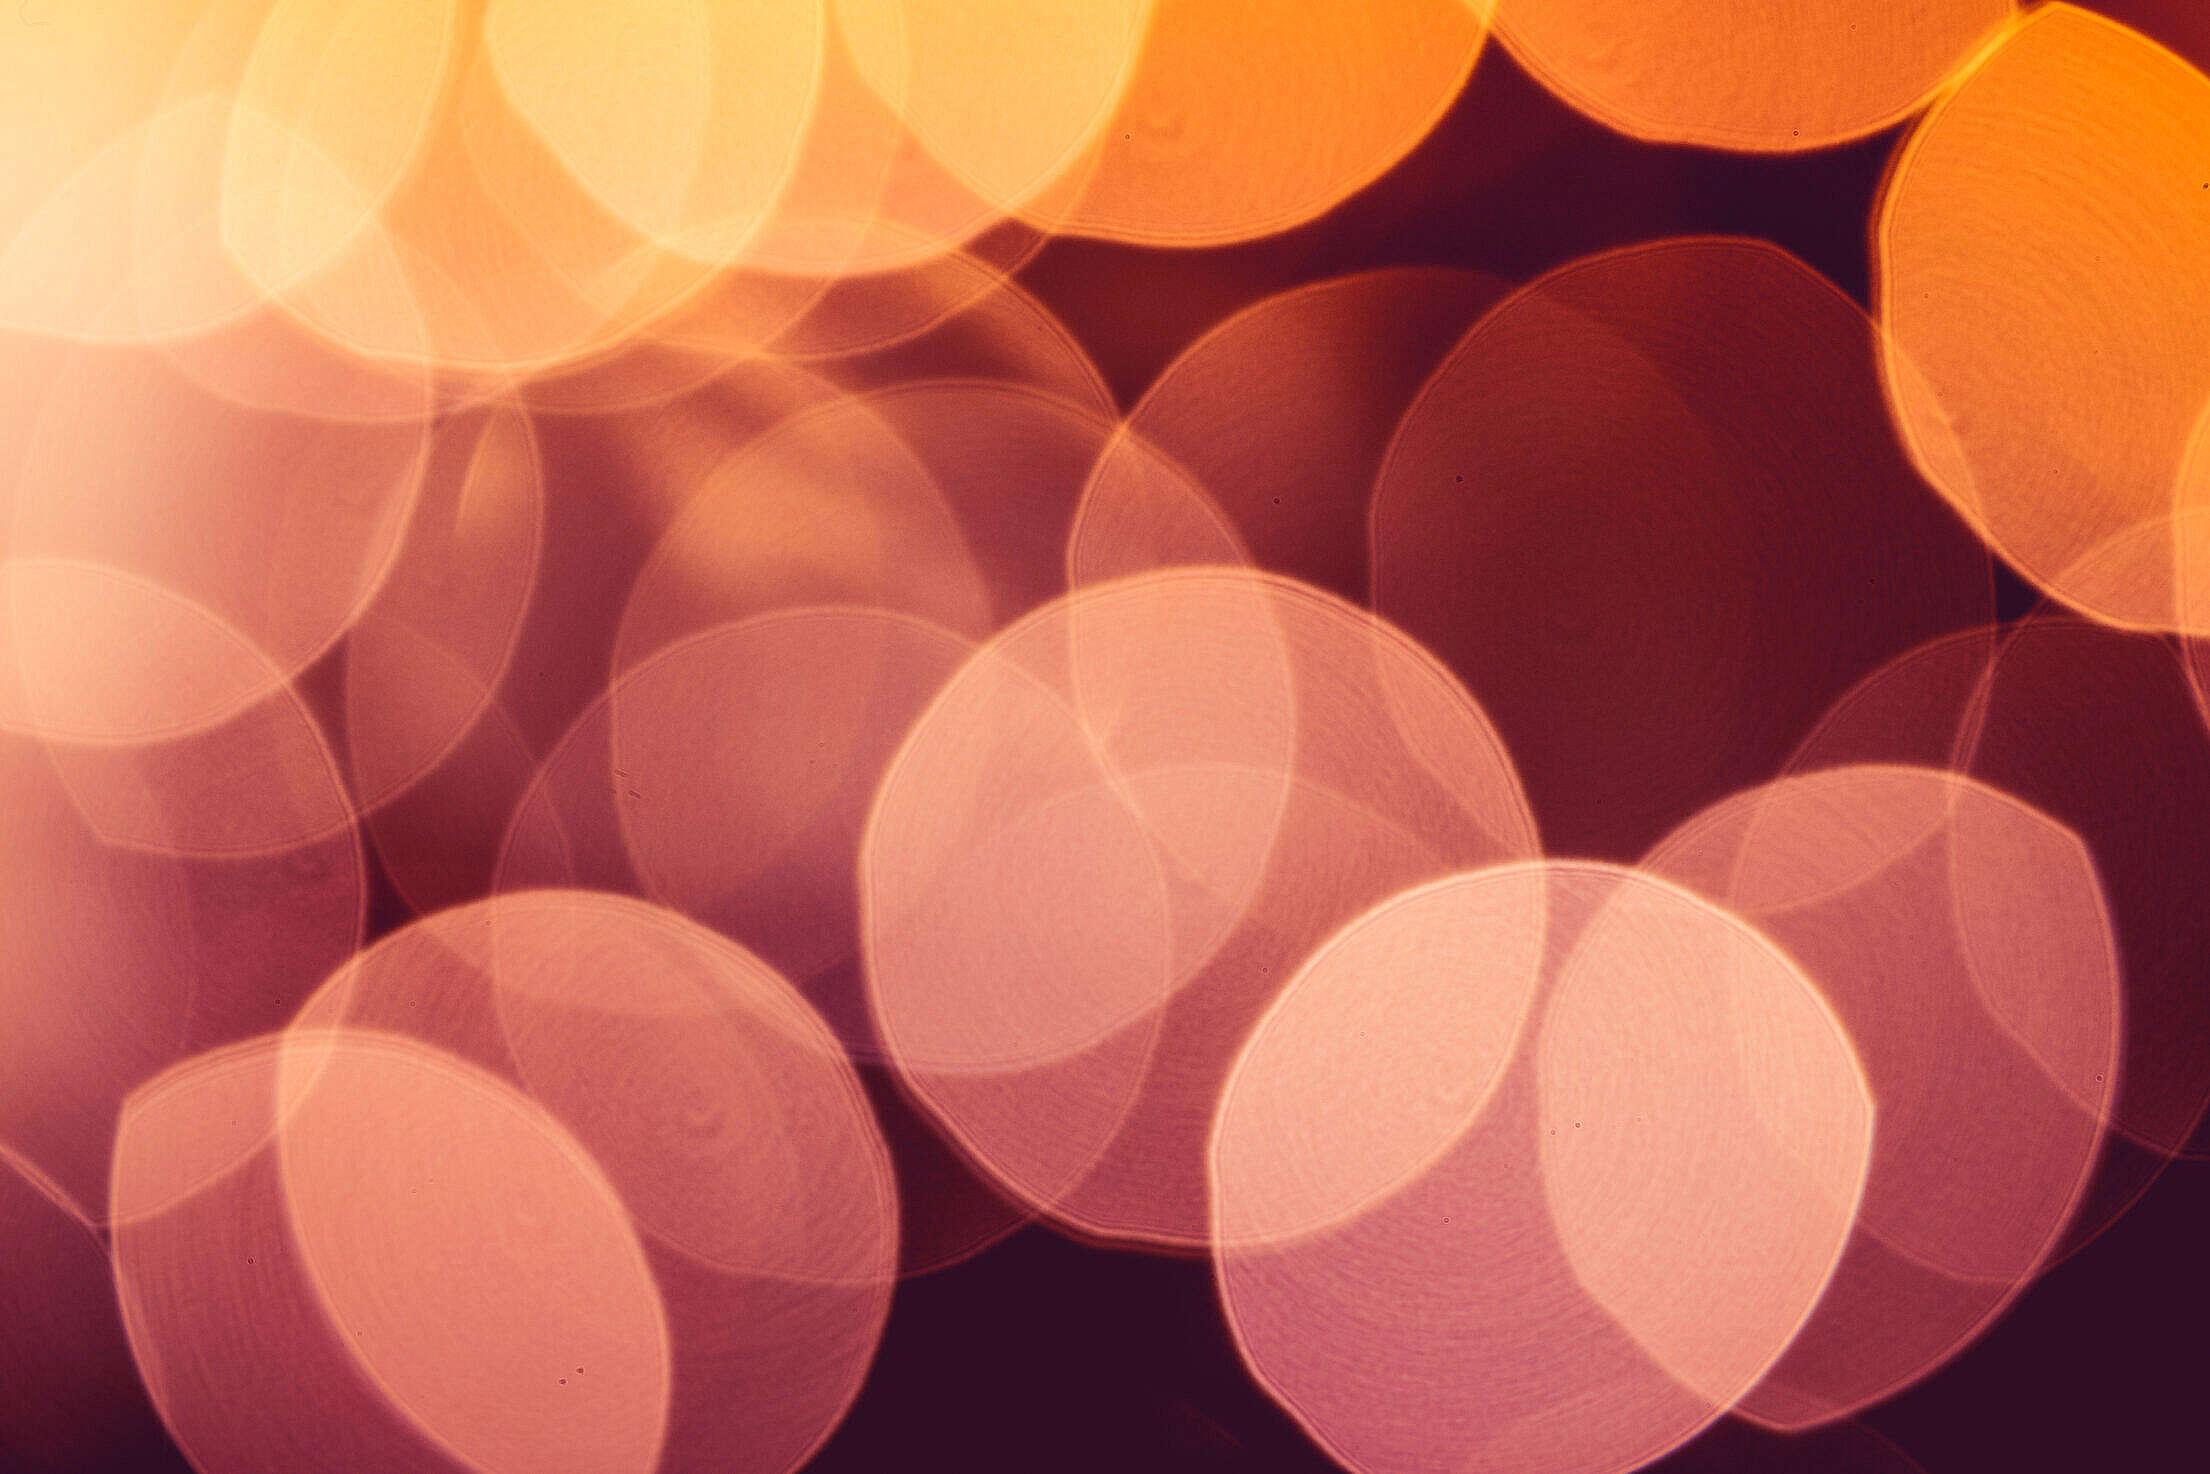 Real Orange Abstract Bokeh Lights Free Stock Photo